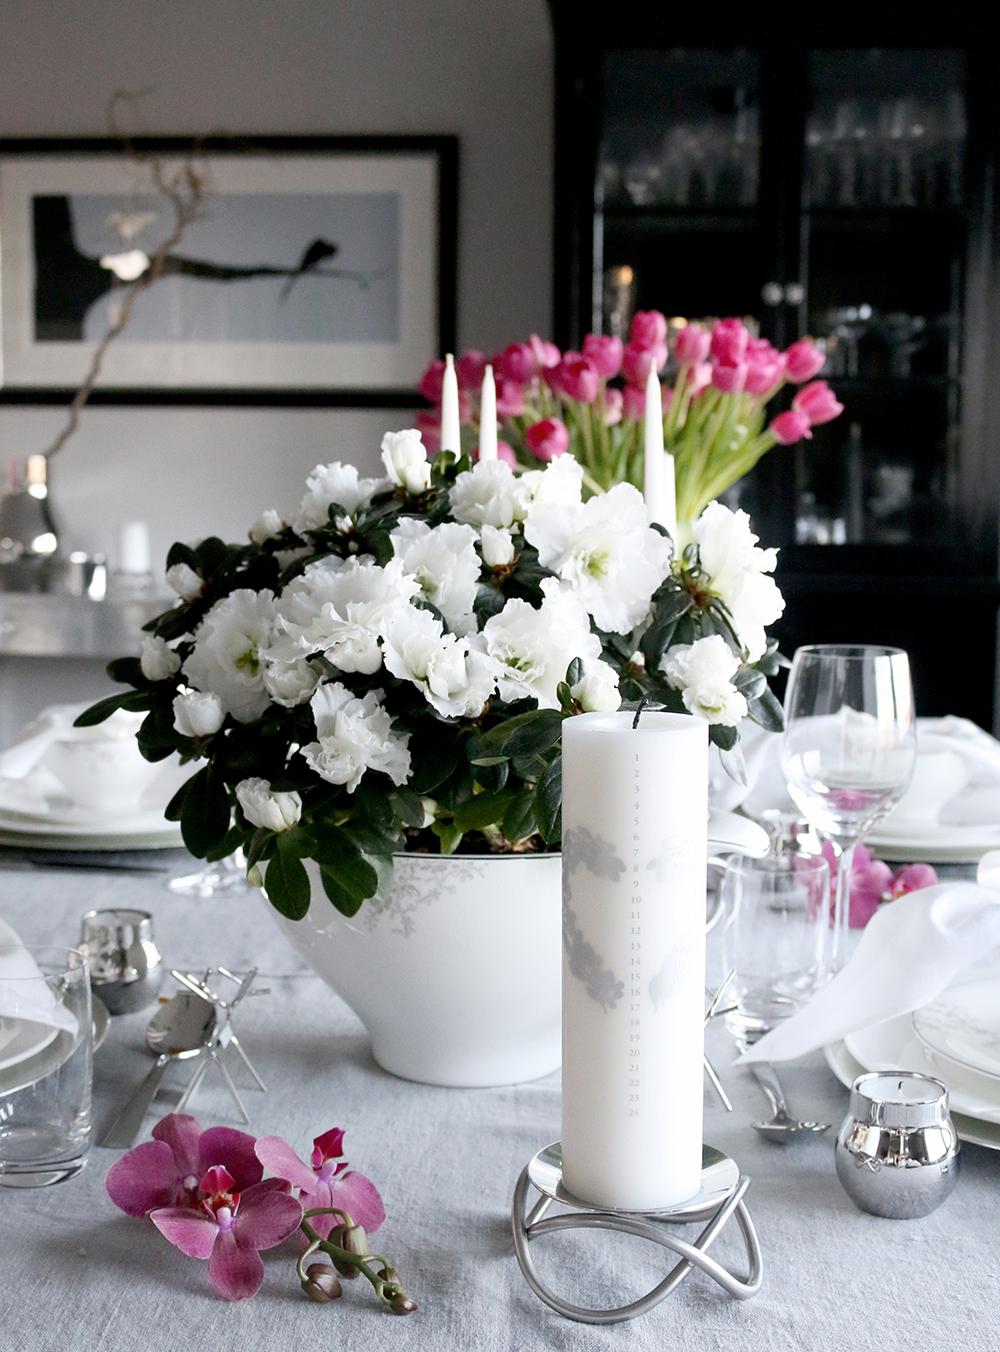 Tilbords Table setting Advent grey hvite purple 27